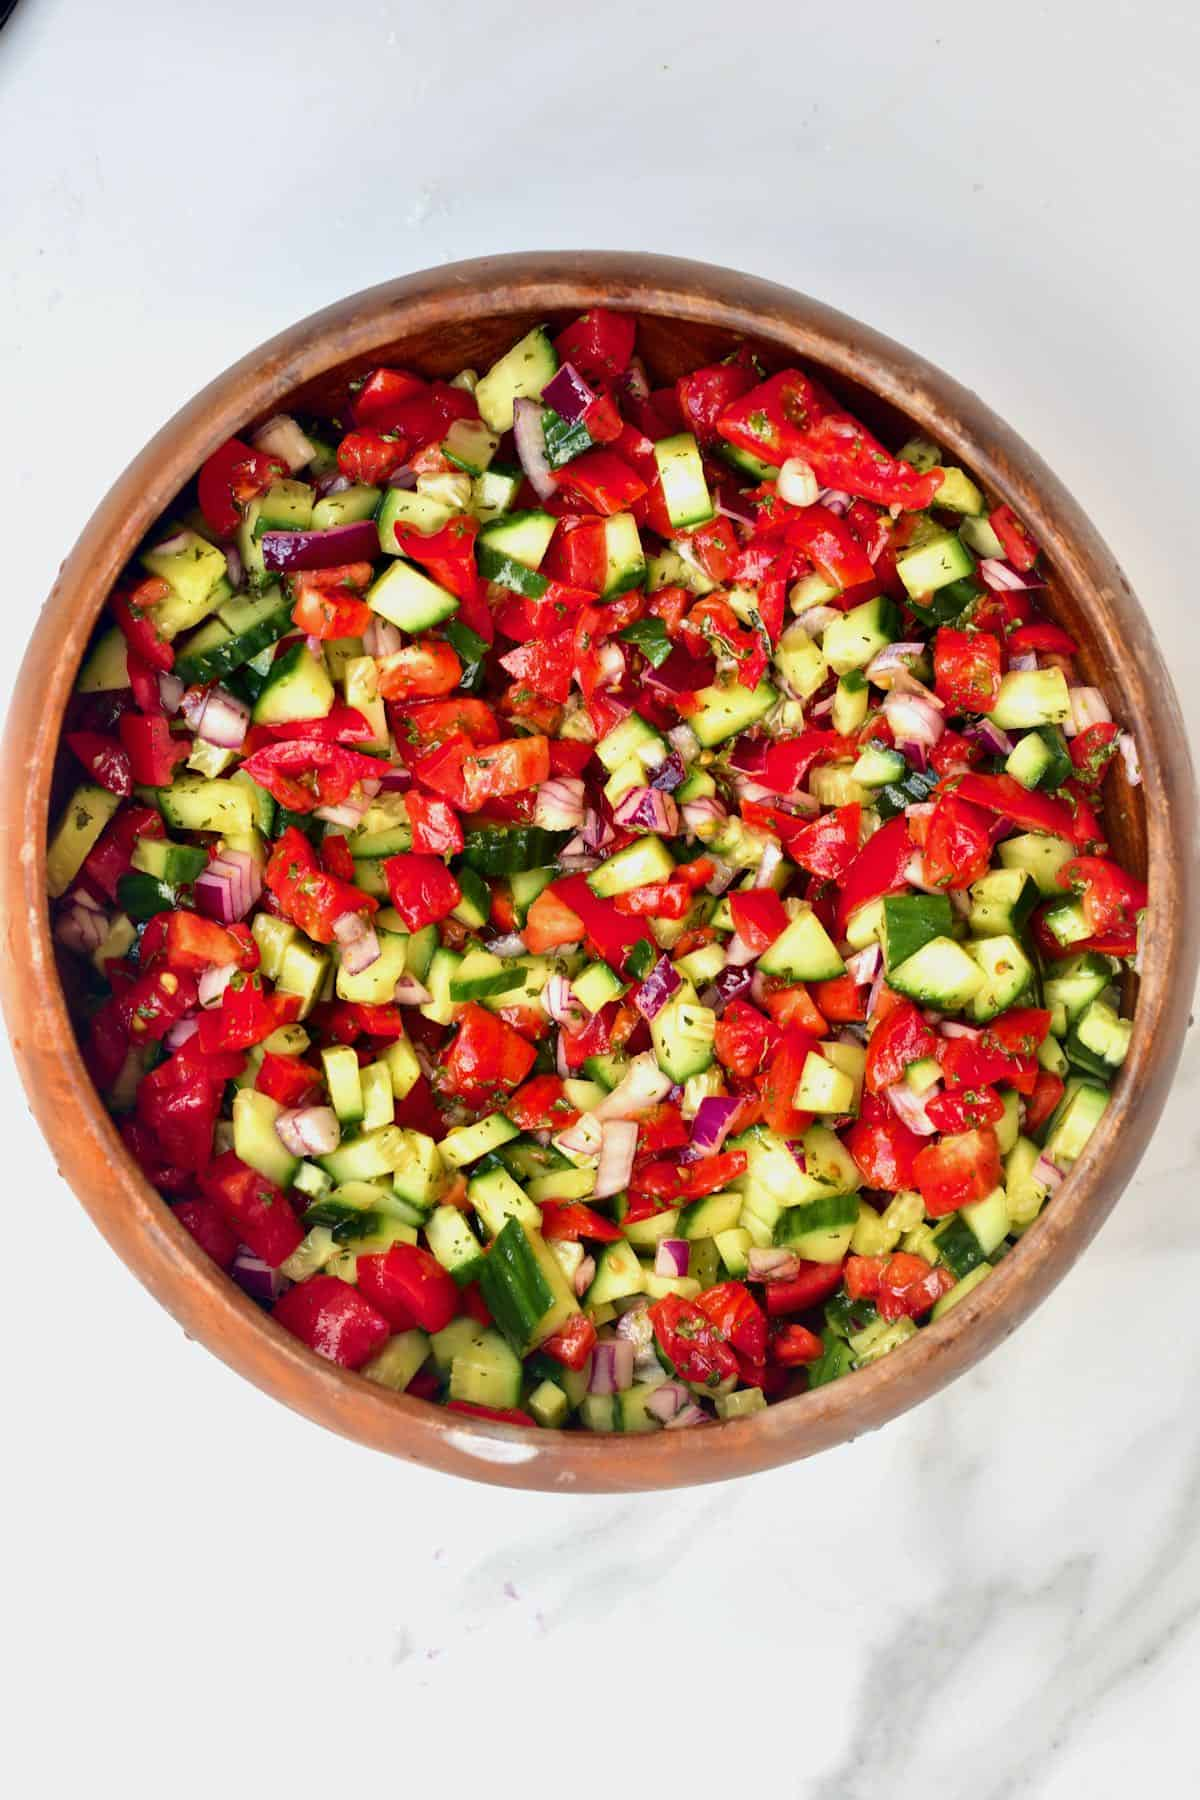 A bowl with shirazi salad